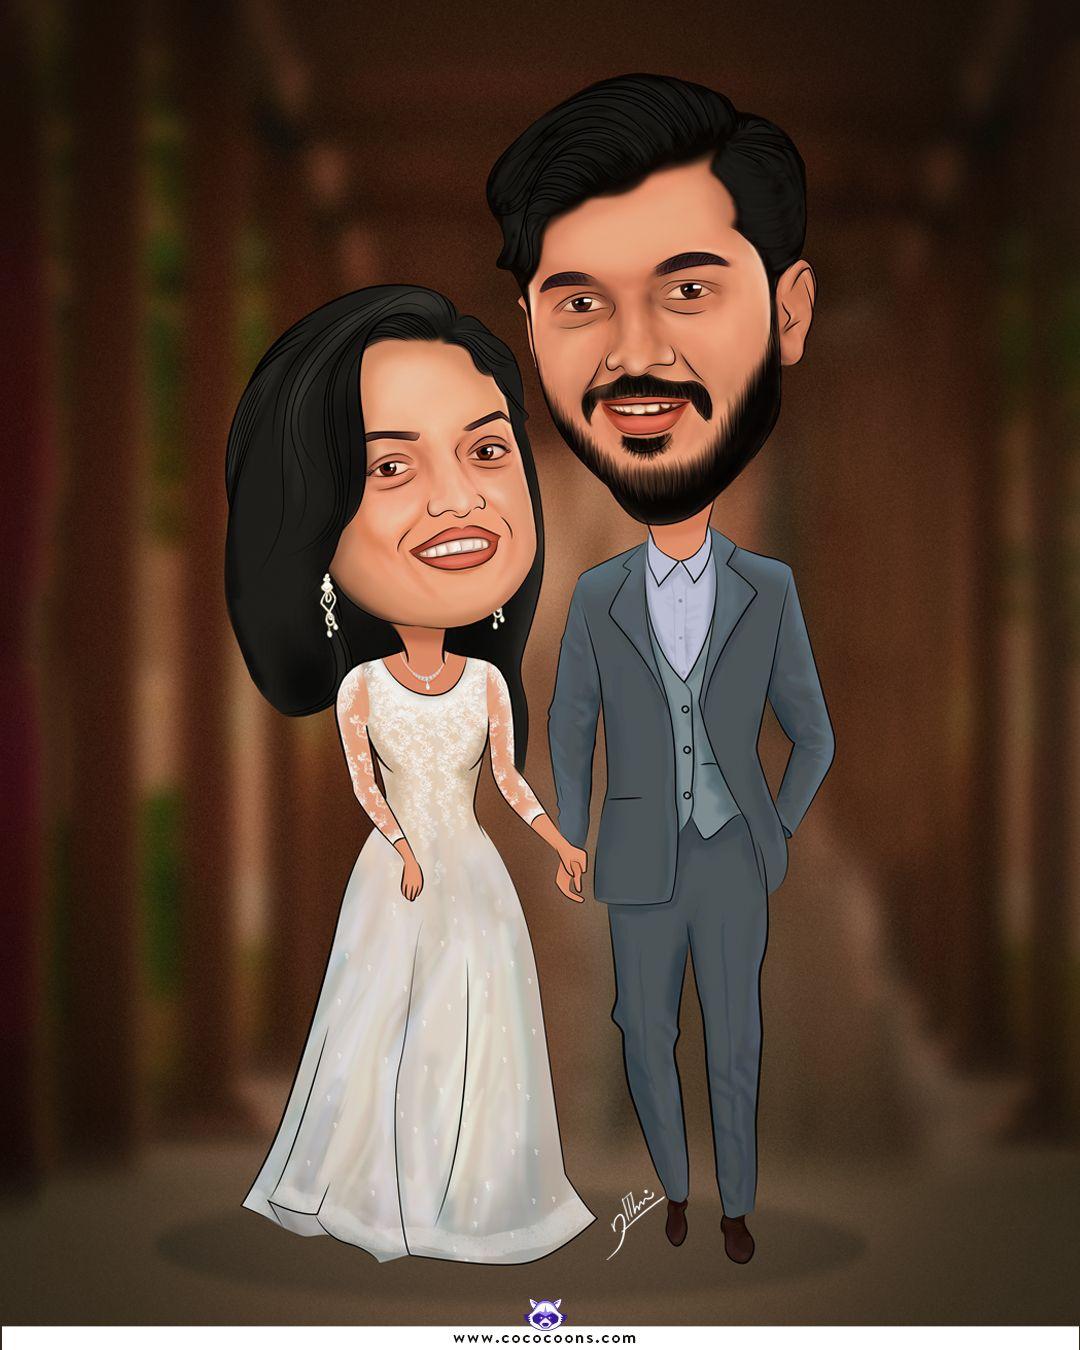 christian wedding caricature, Custom Caricatures